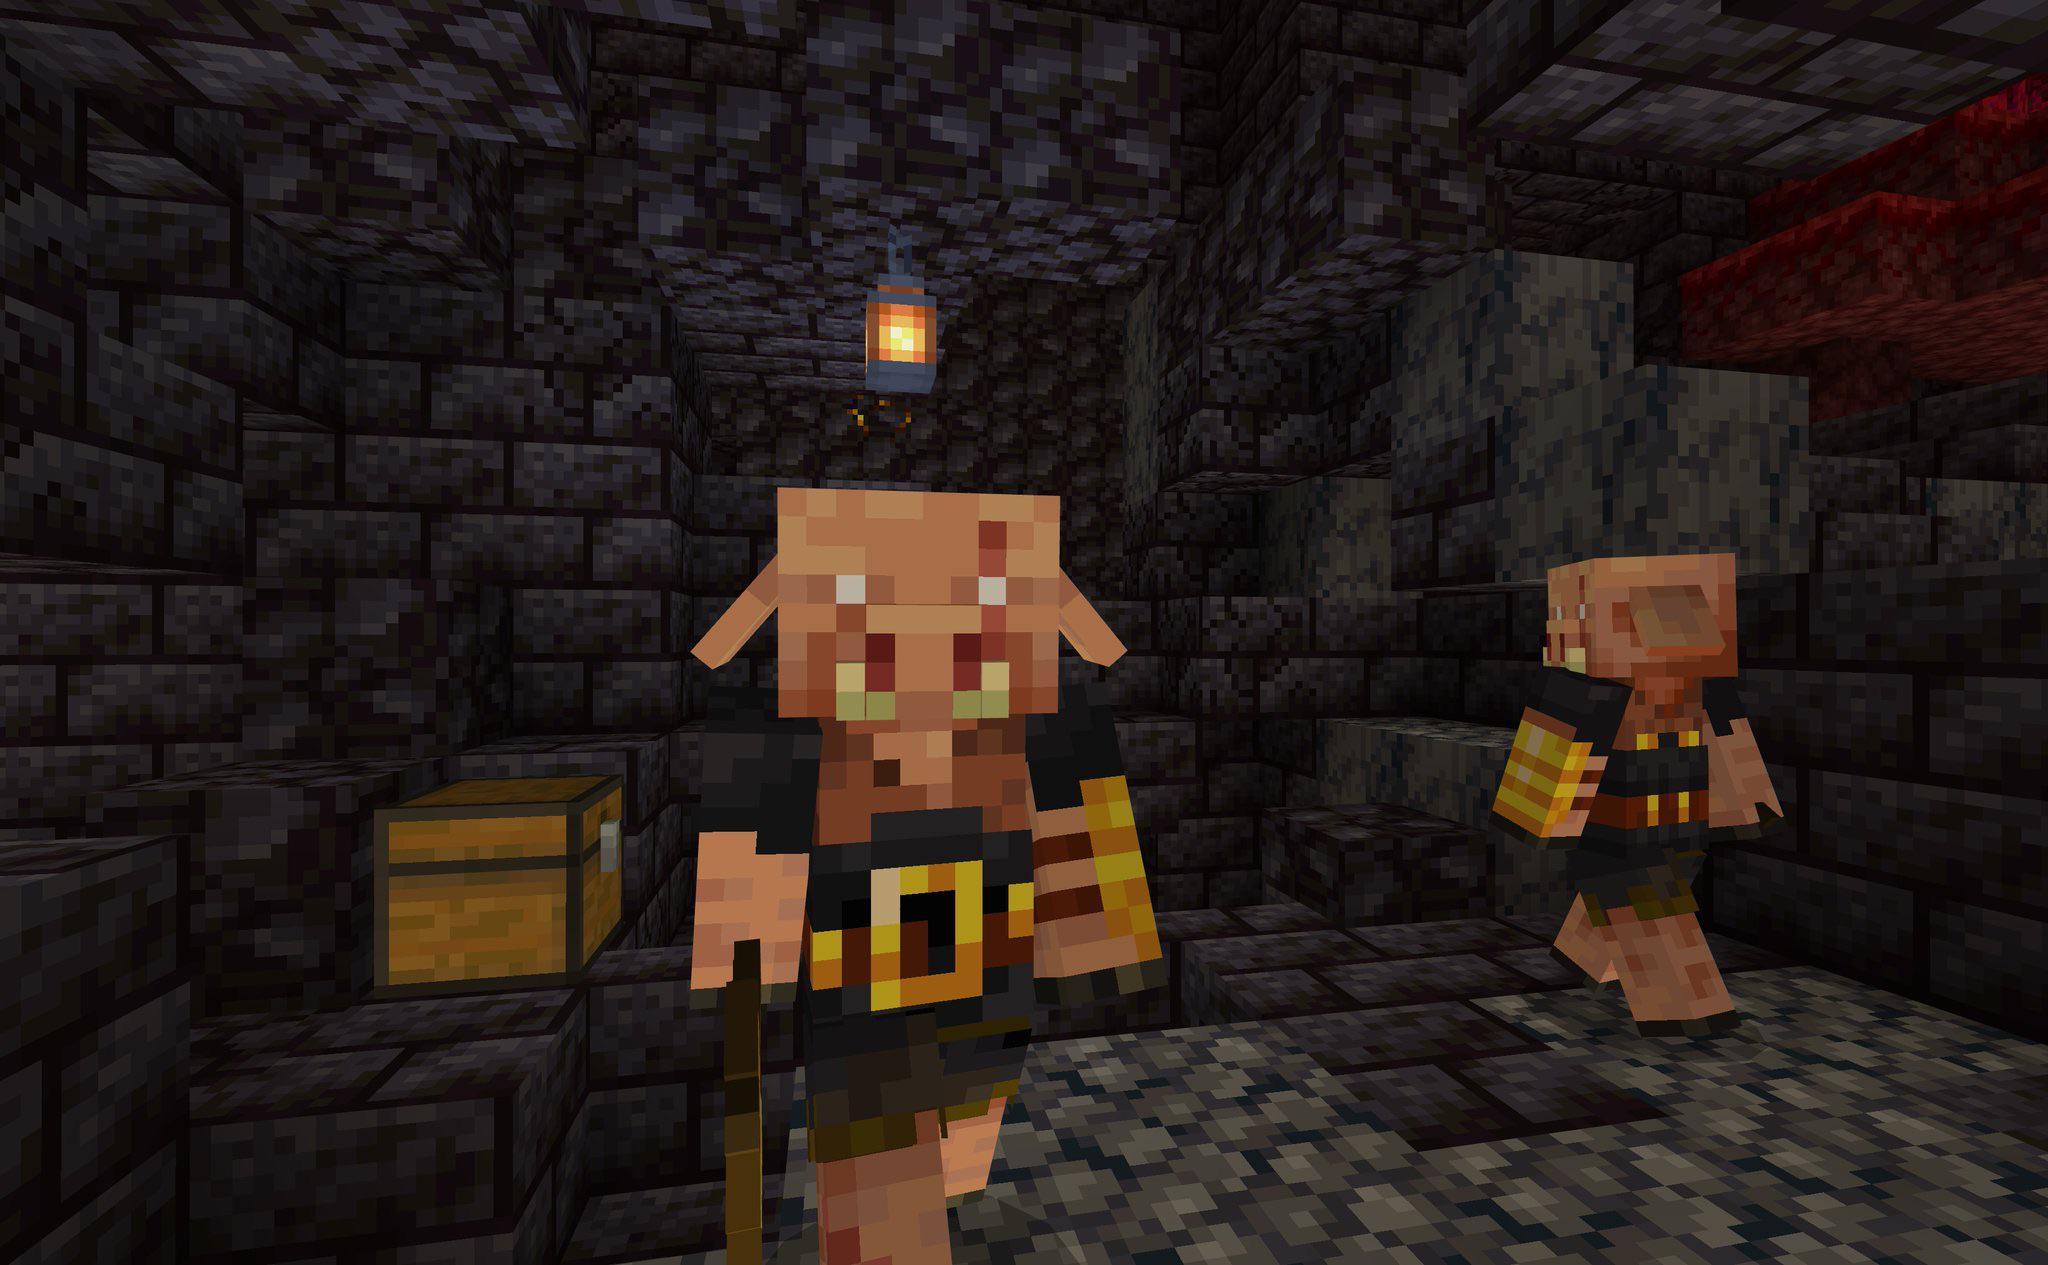 Minecraft update 1.16.40 piglin brutes